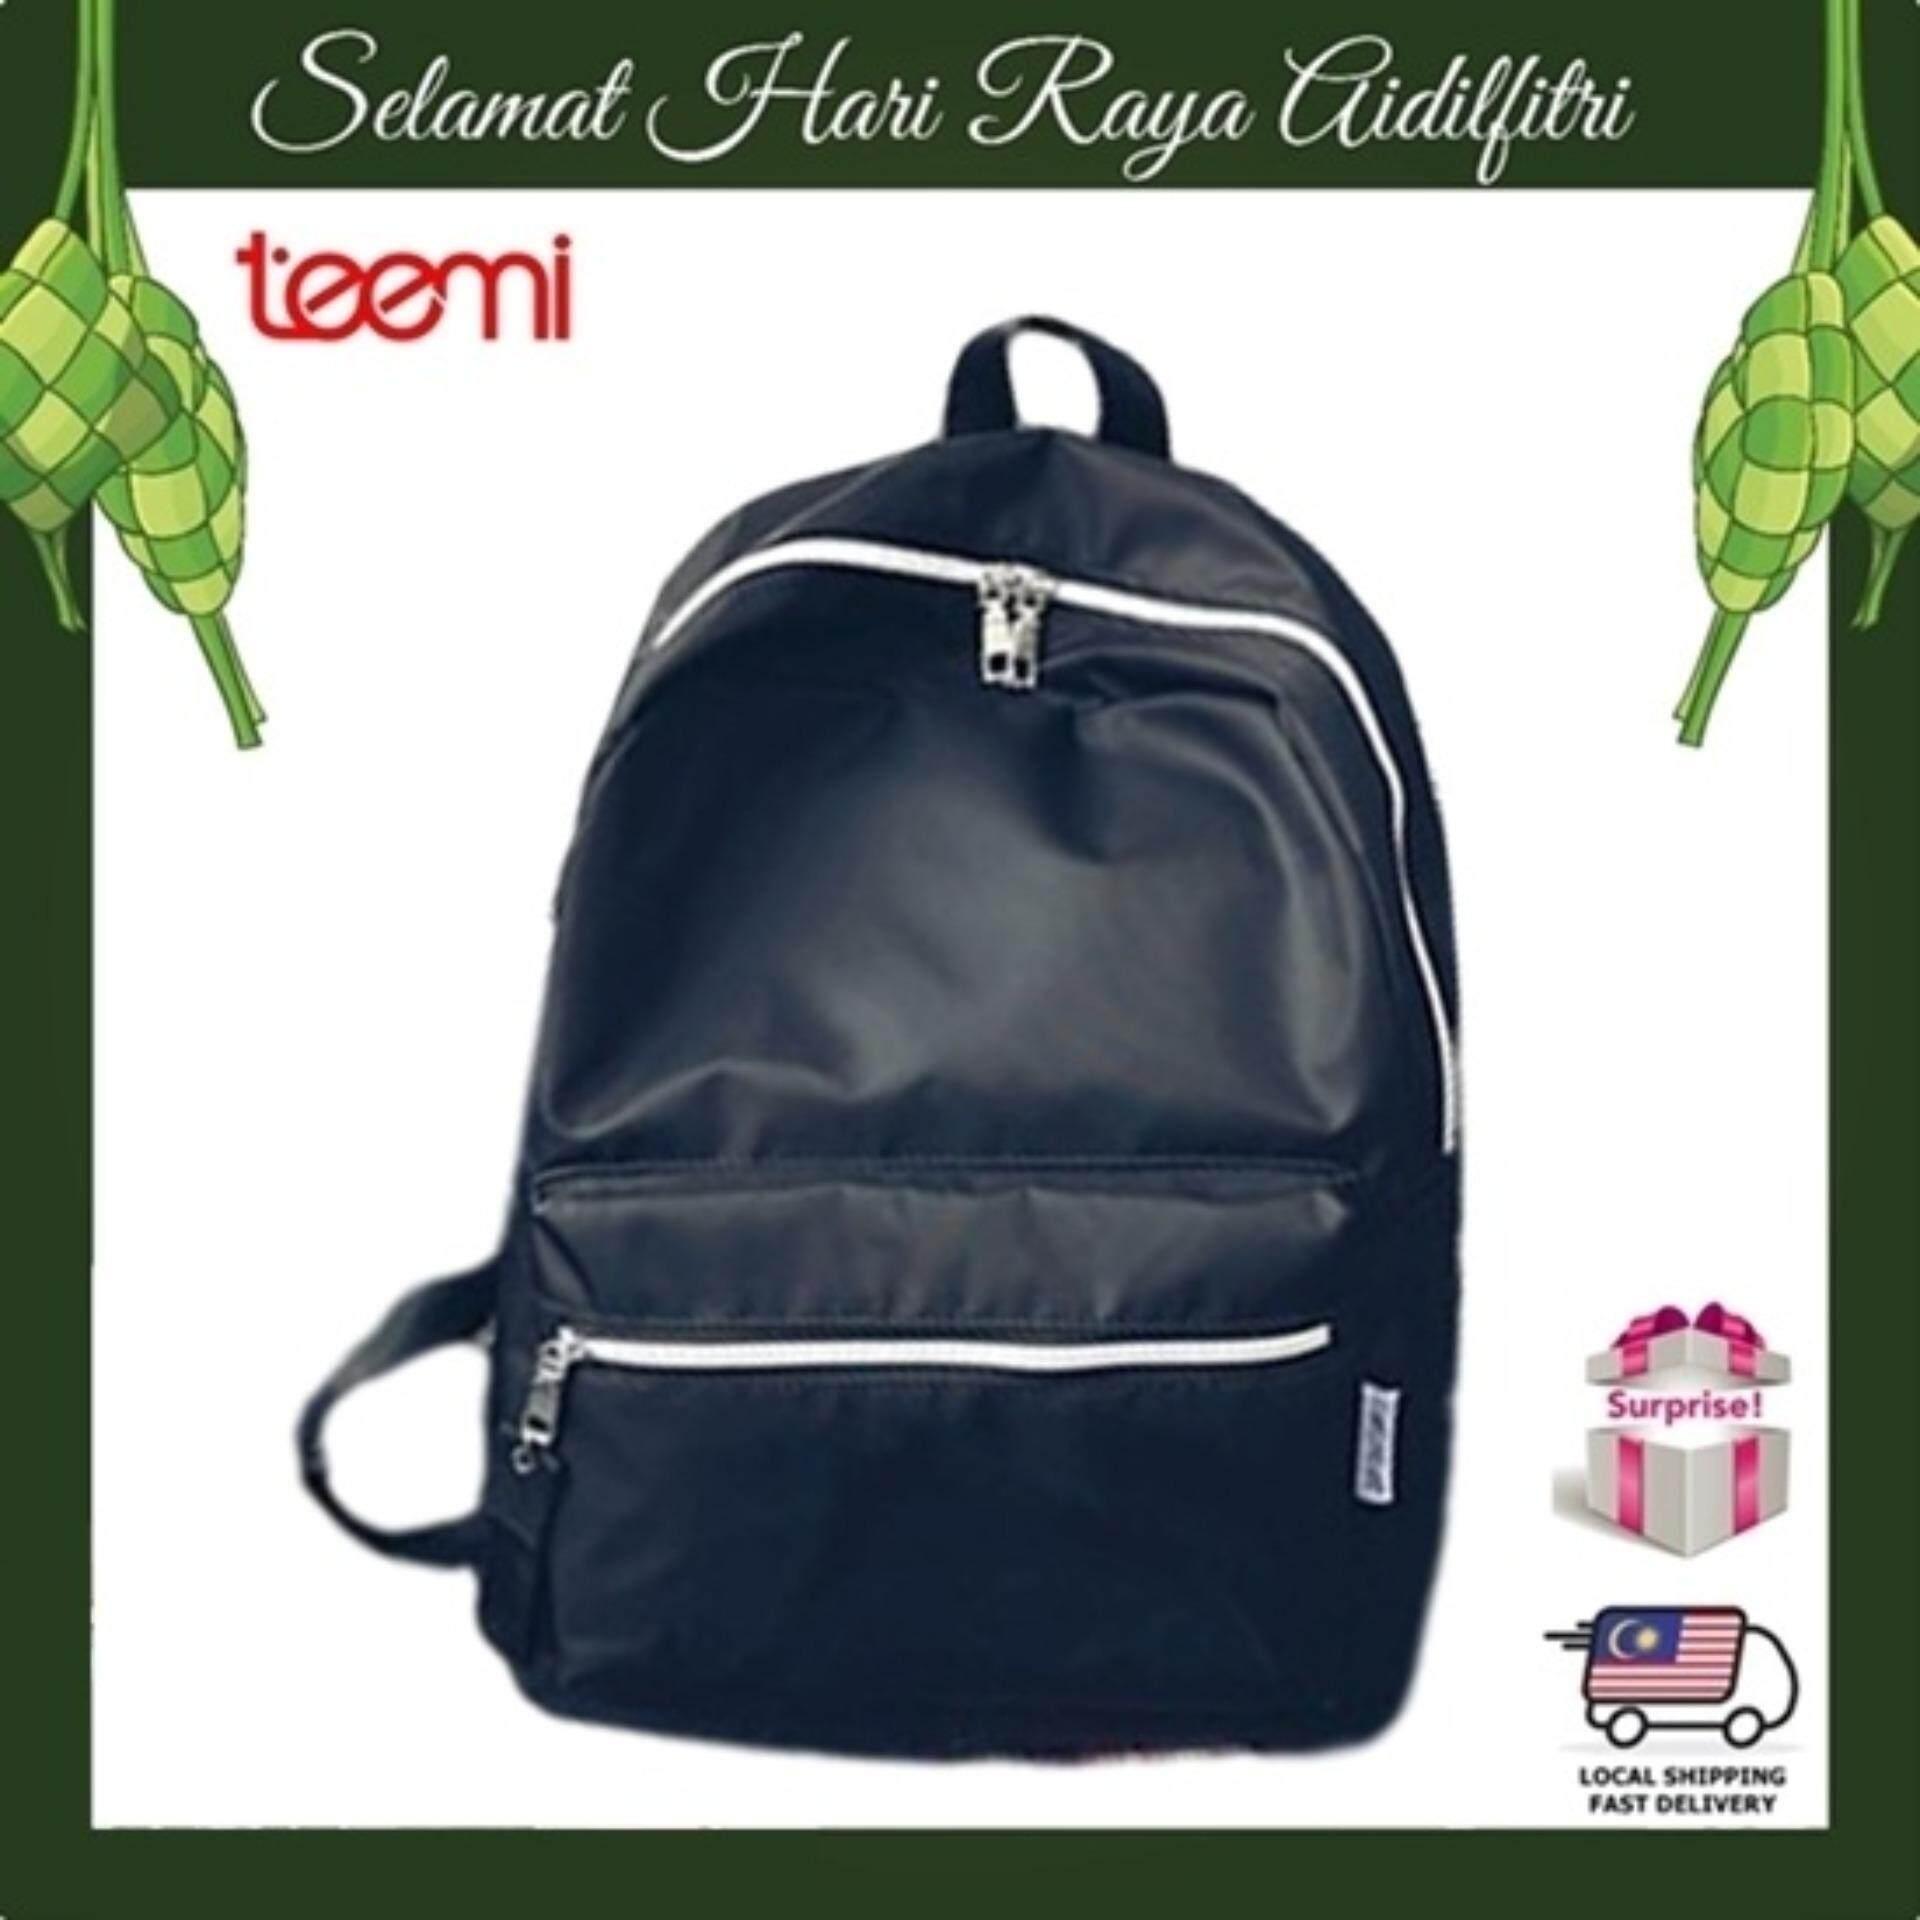 TEEMI Unisex Fashion Travel Leisure Bag Water Resistant Nylon Backpack - Black